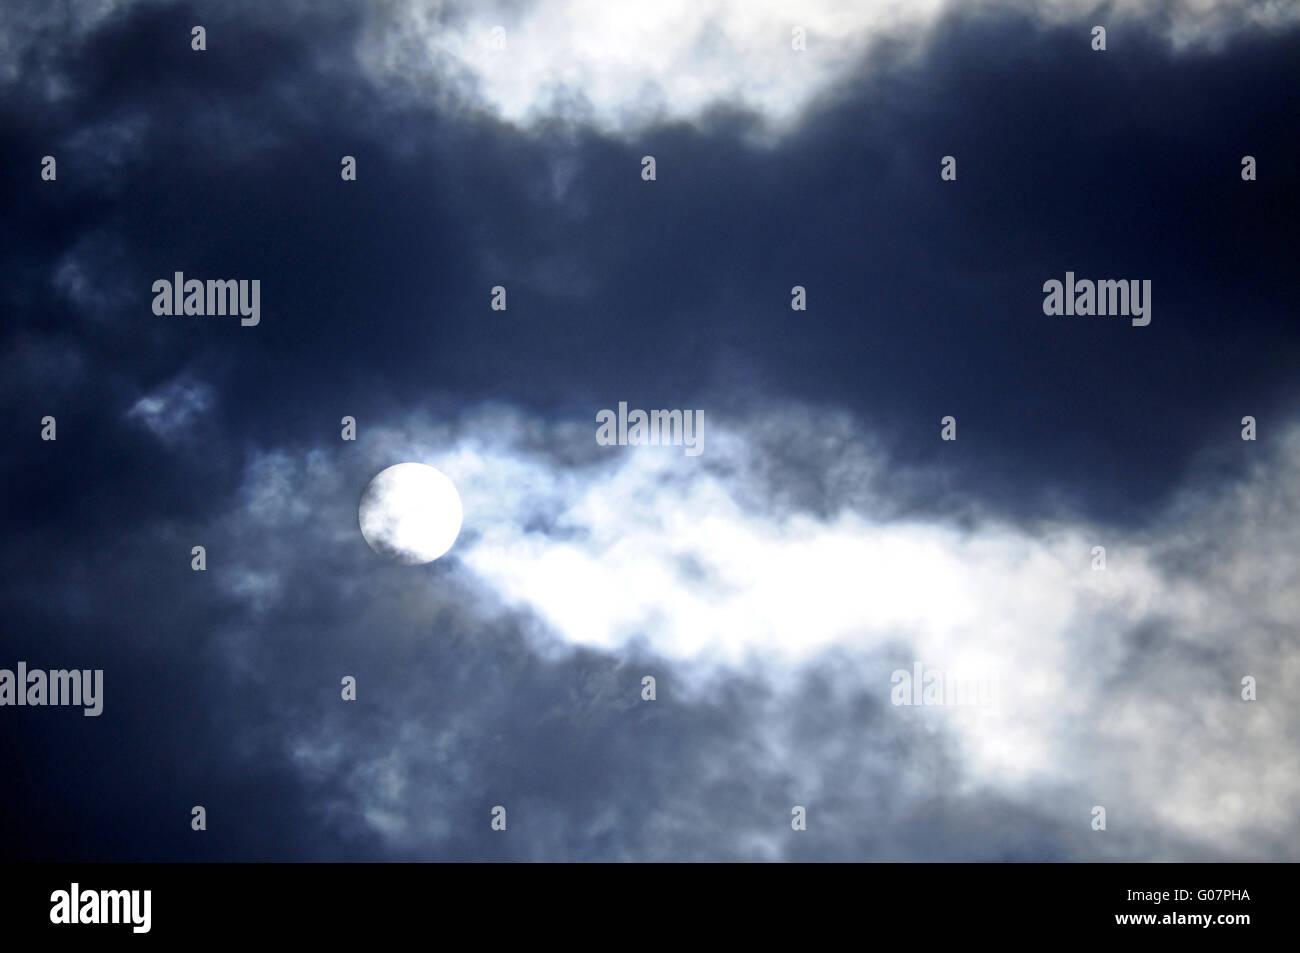 Mystical night scene. Stock Photo